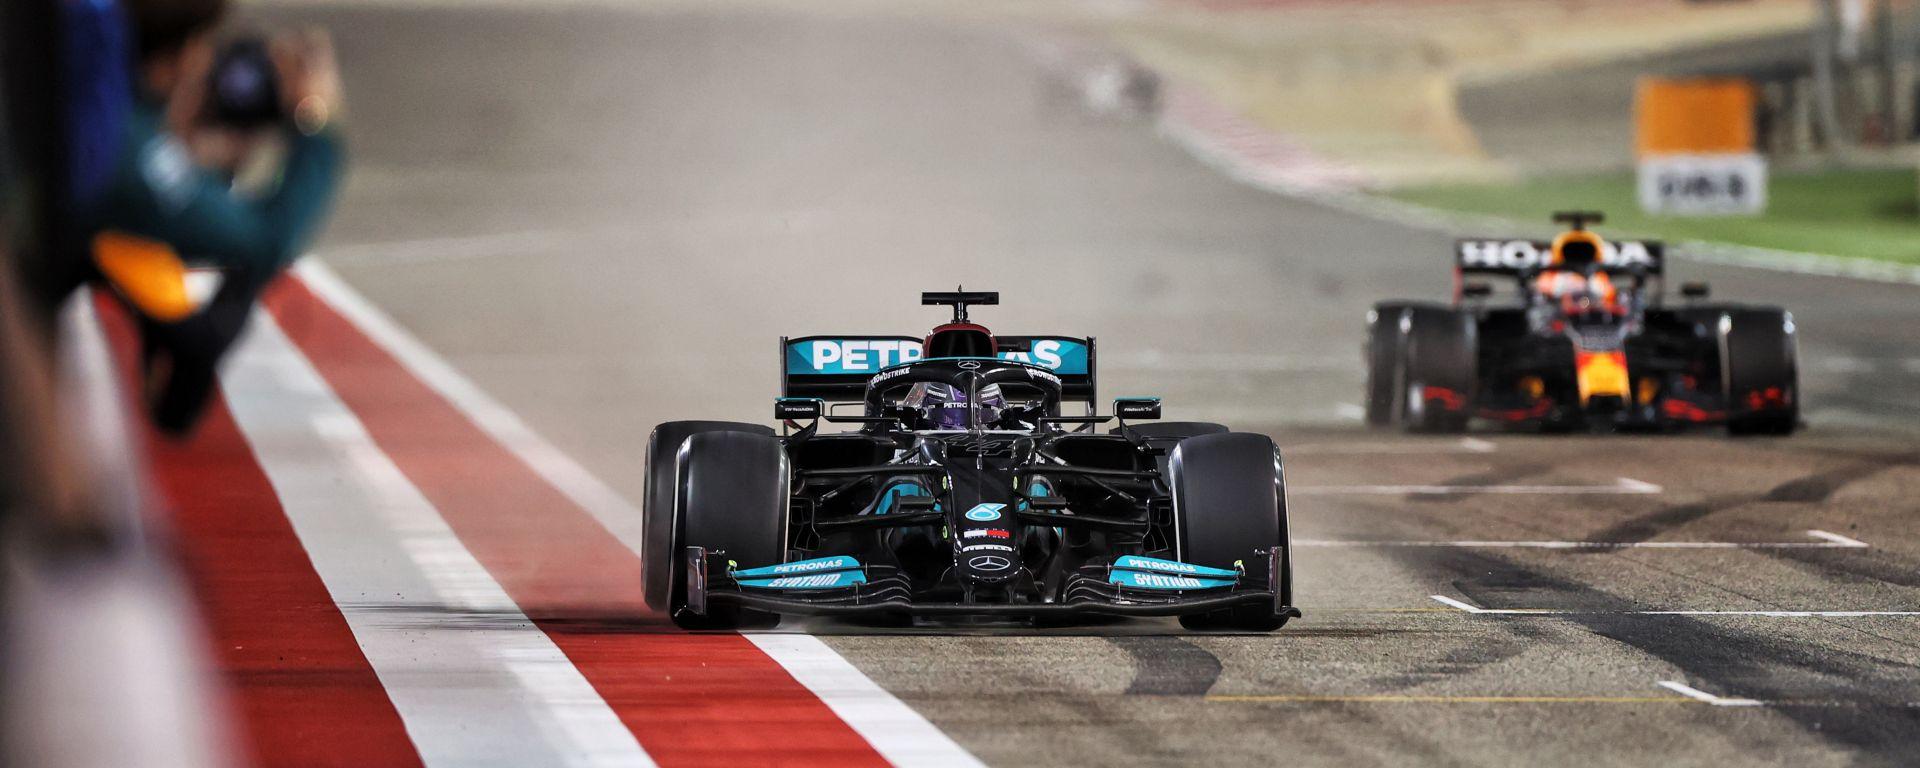 F1 GP Bahrain 2021, Sakhir: Lewis Hamilton (Mercedes) seguito da Max Verstappen (Red Bull)